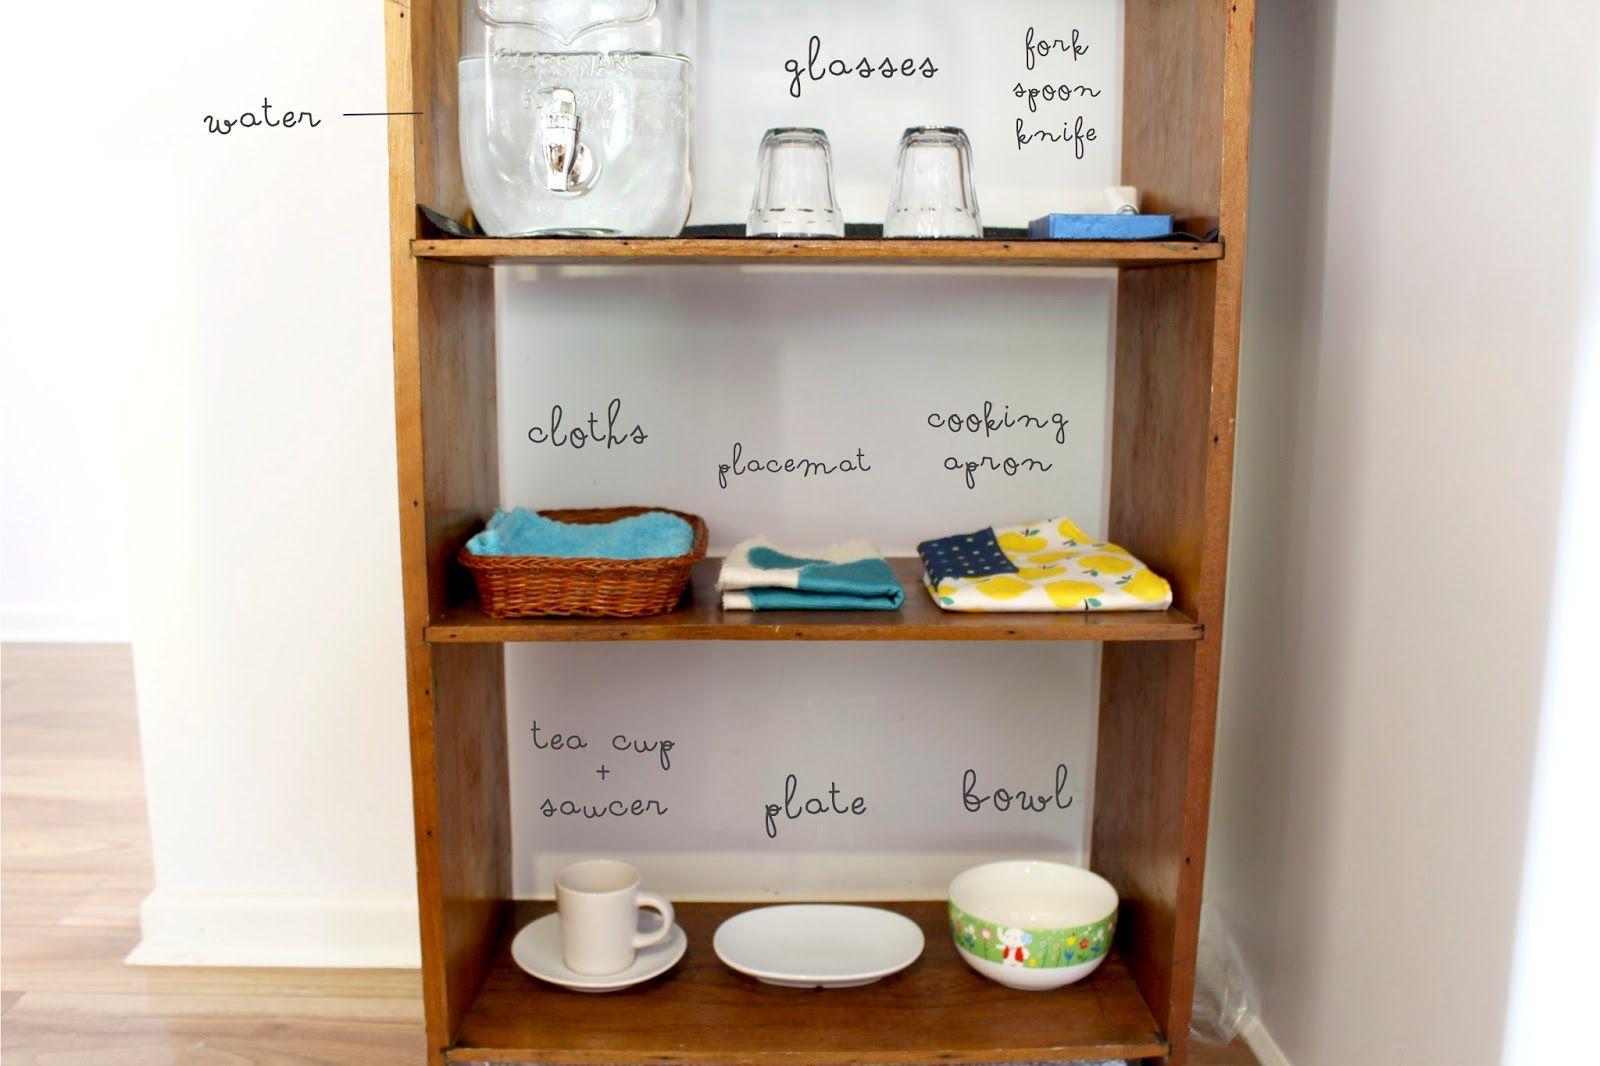 Kitchen Shelf Belle And Beau Montessori Beaus Montessori Kitchen Shelf